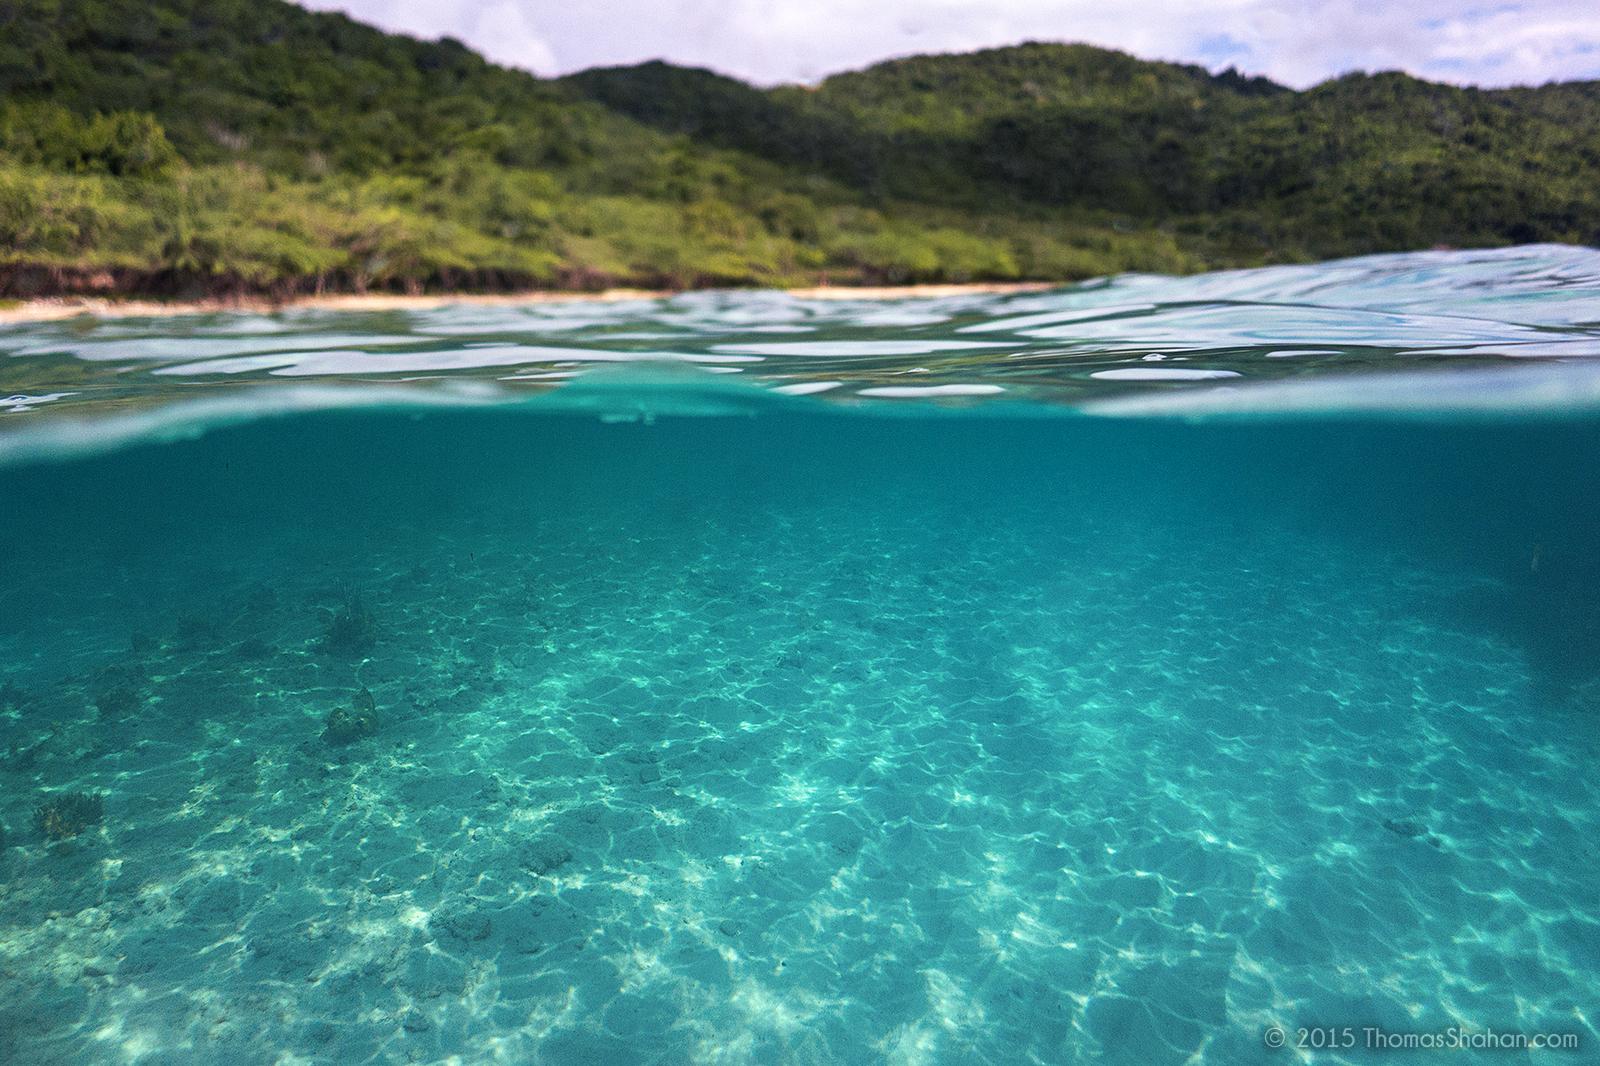 Culebra | © Thomas Shahan/Flickr